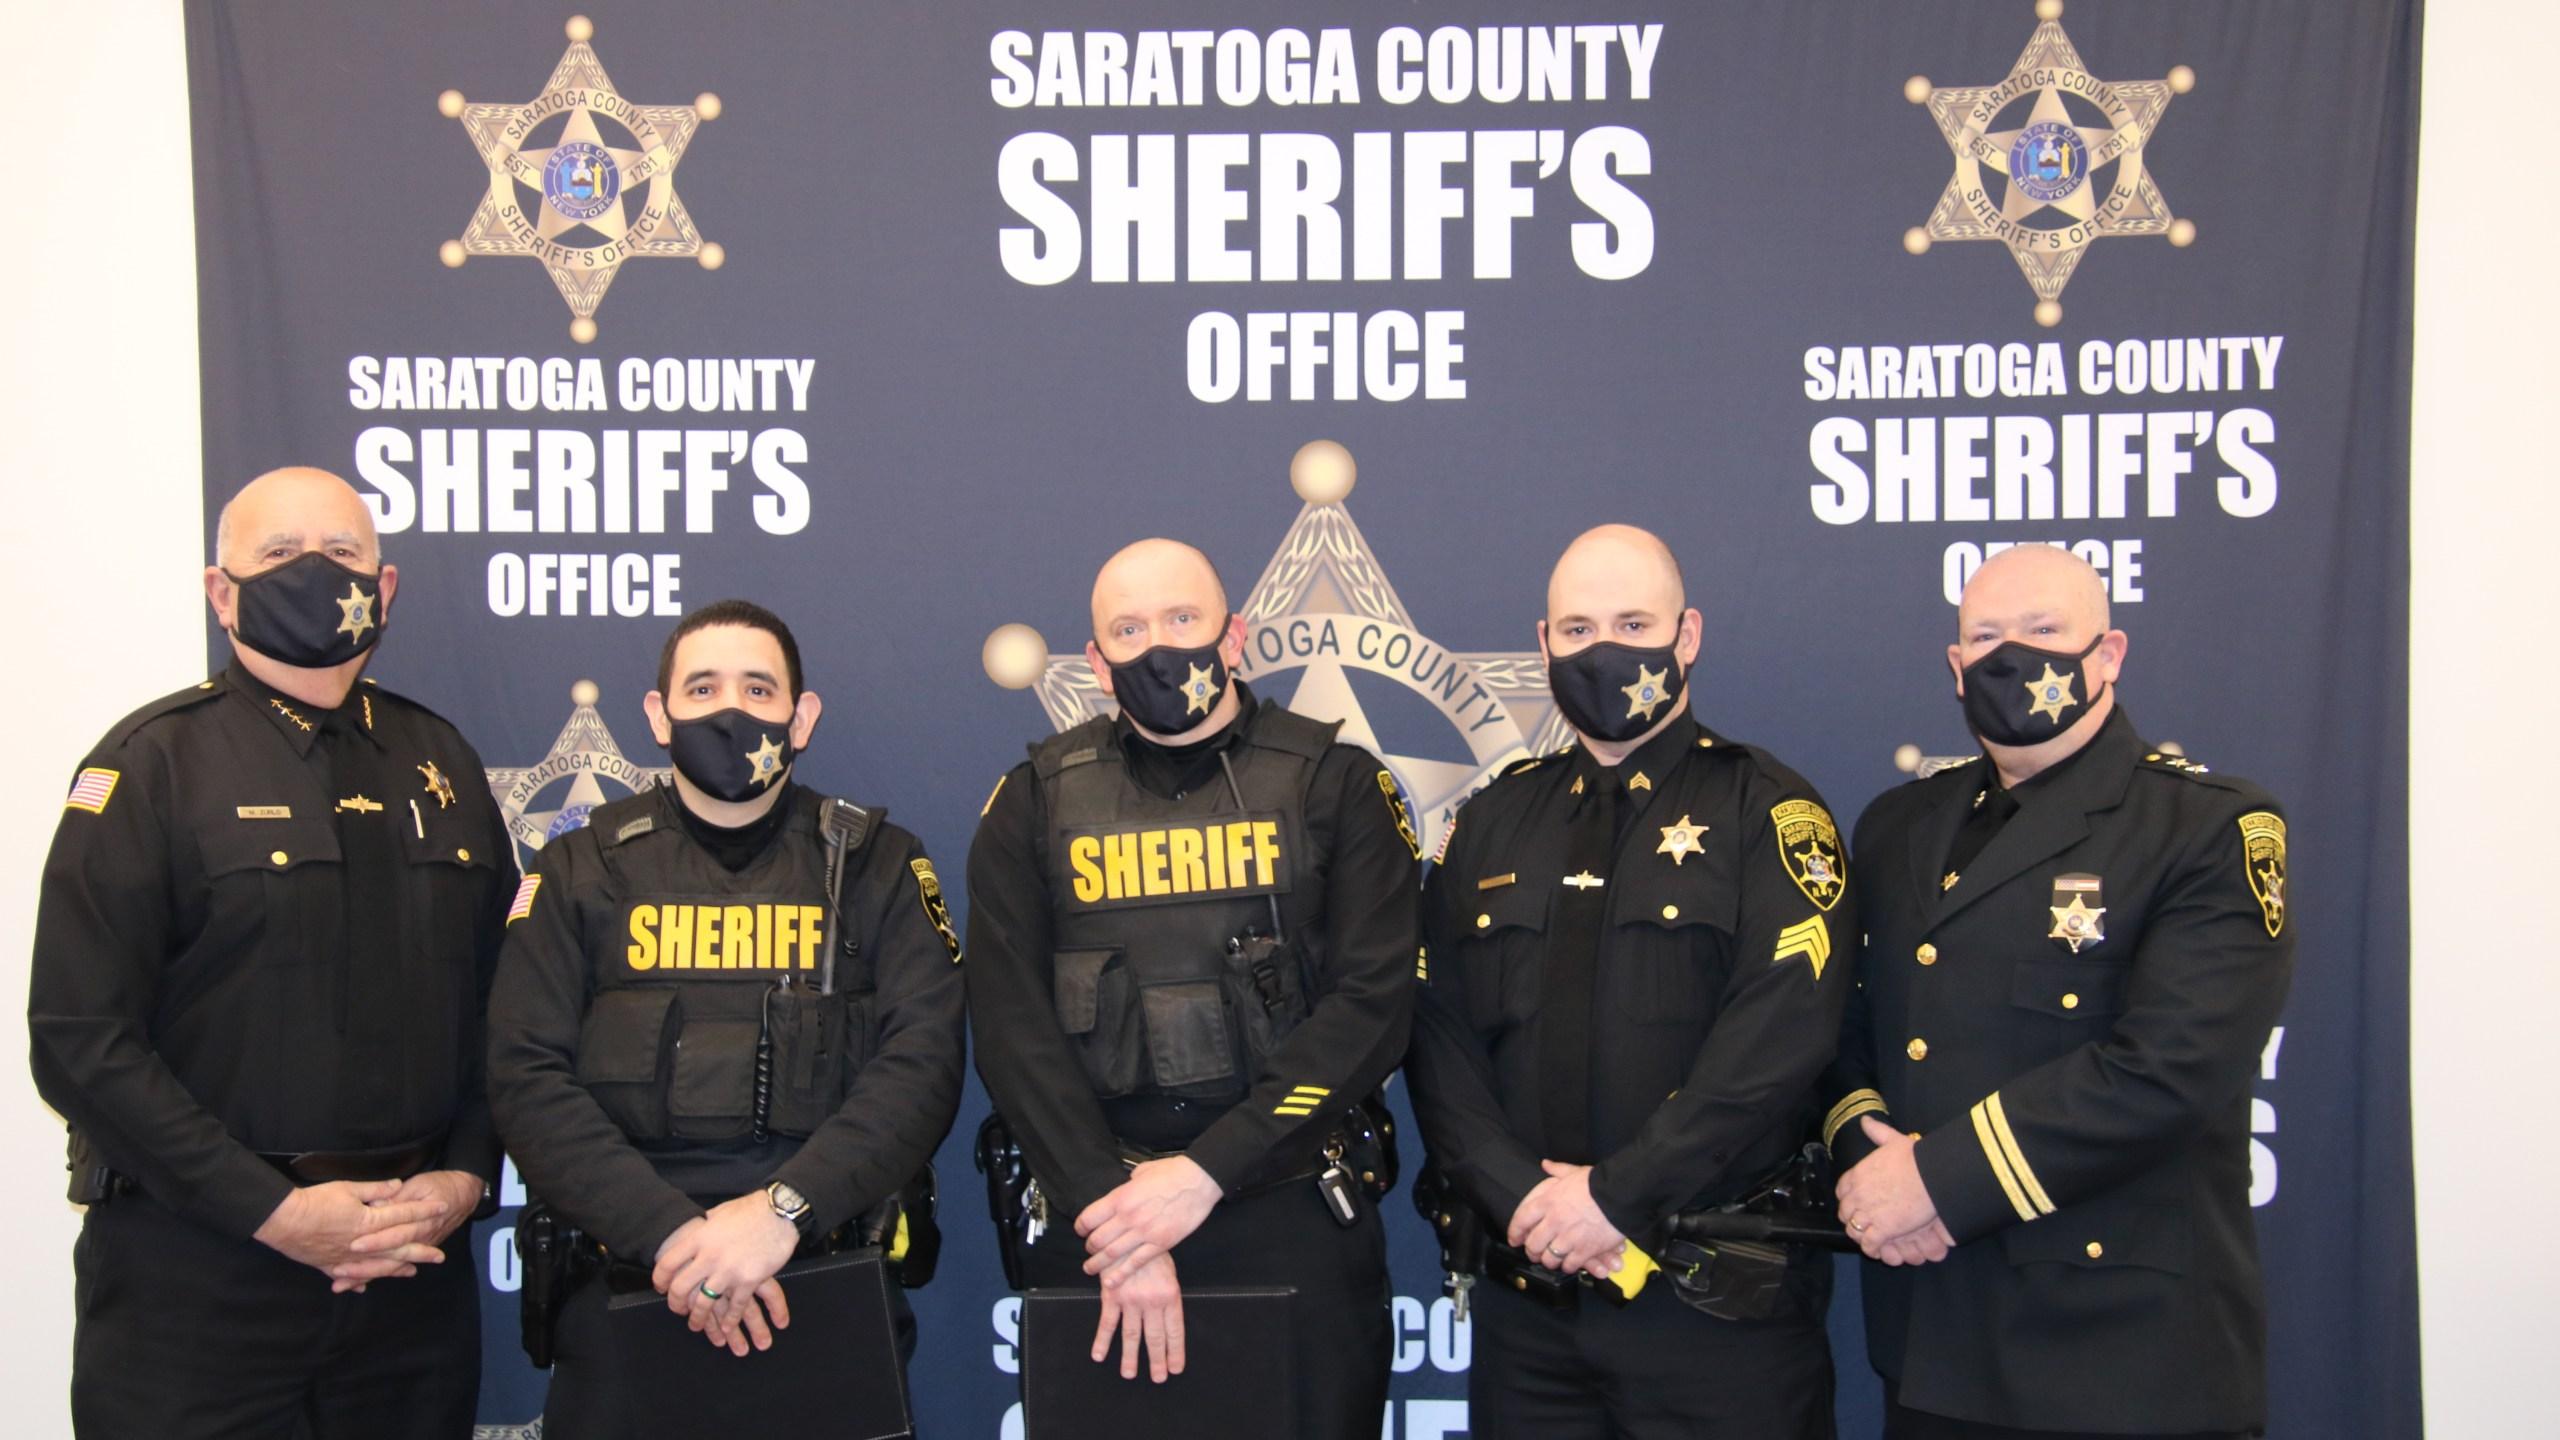 Saratoga County Sheriff's Office award